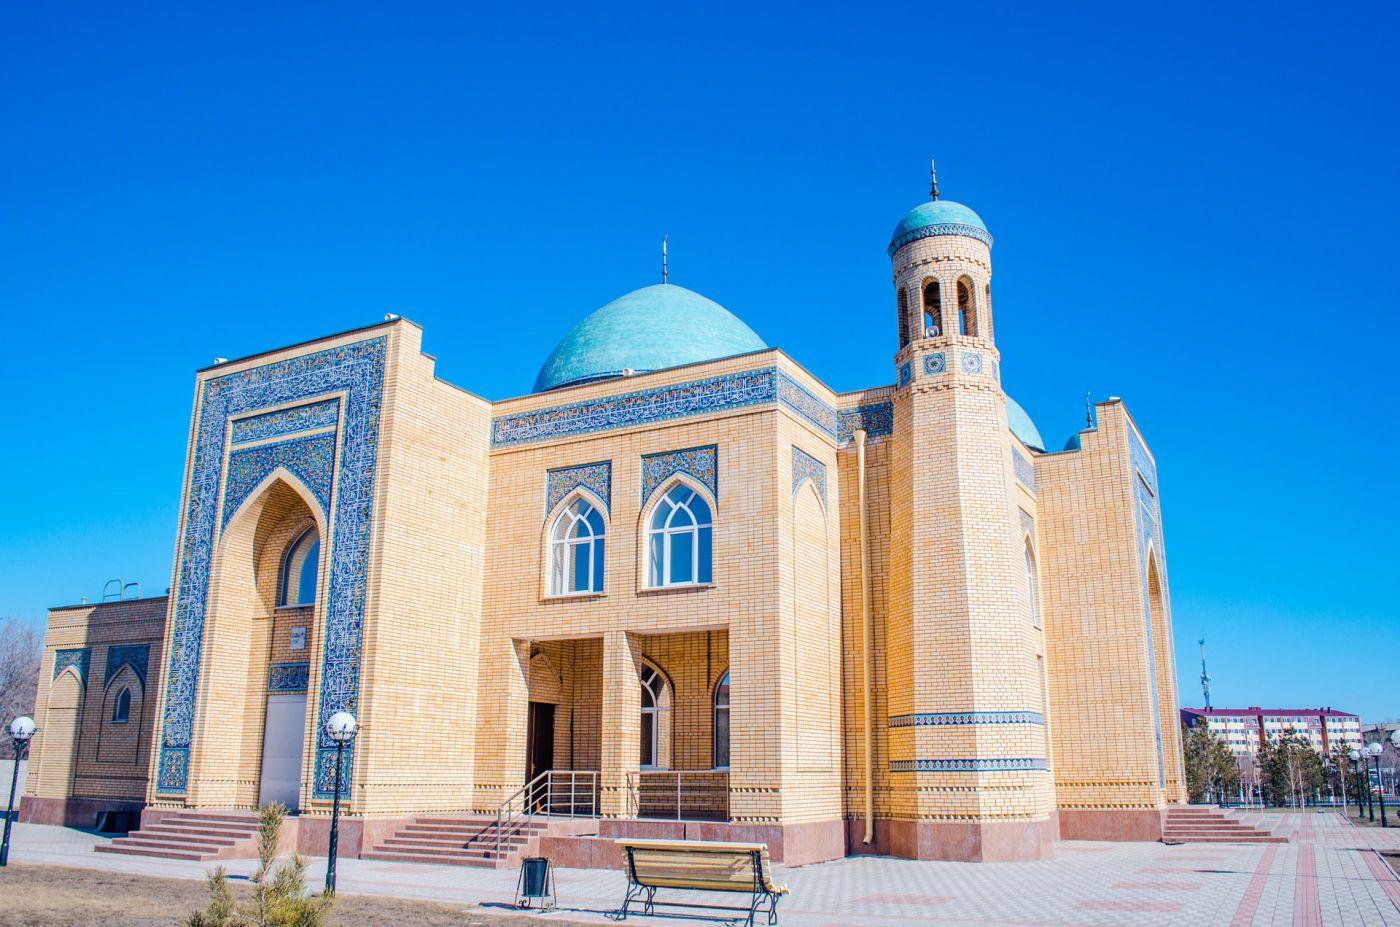 mosque-331113_1920